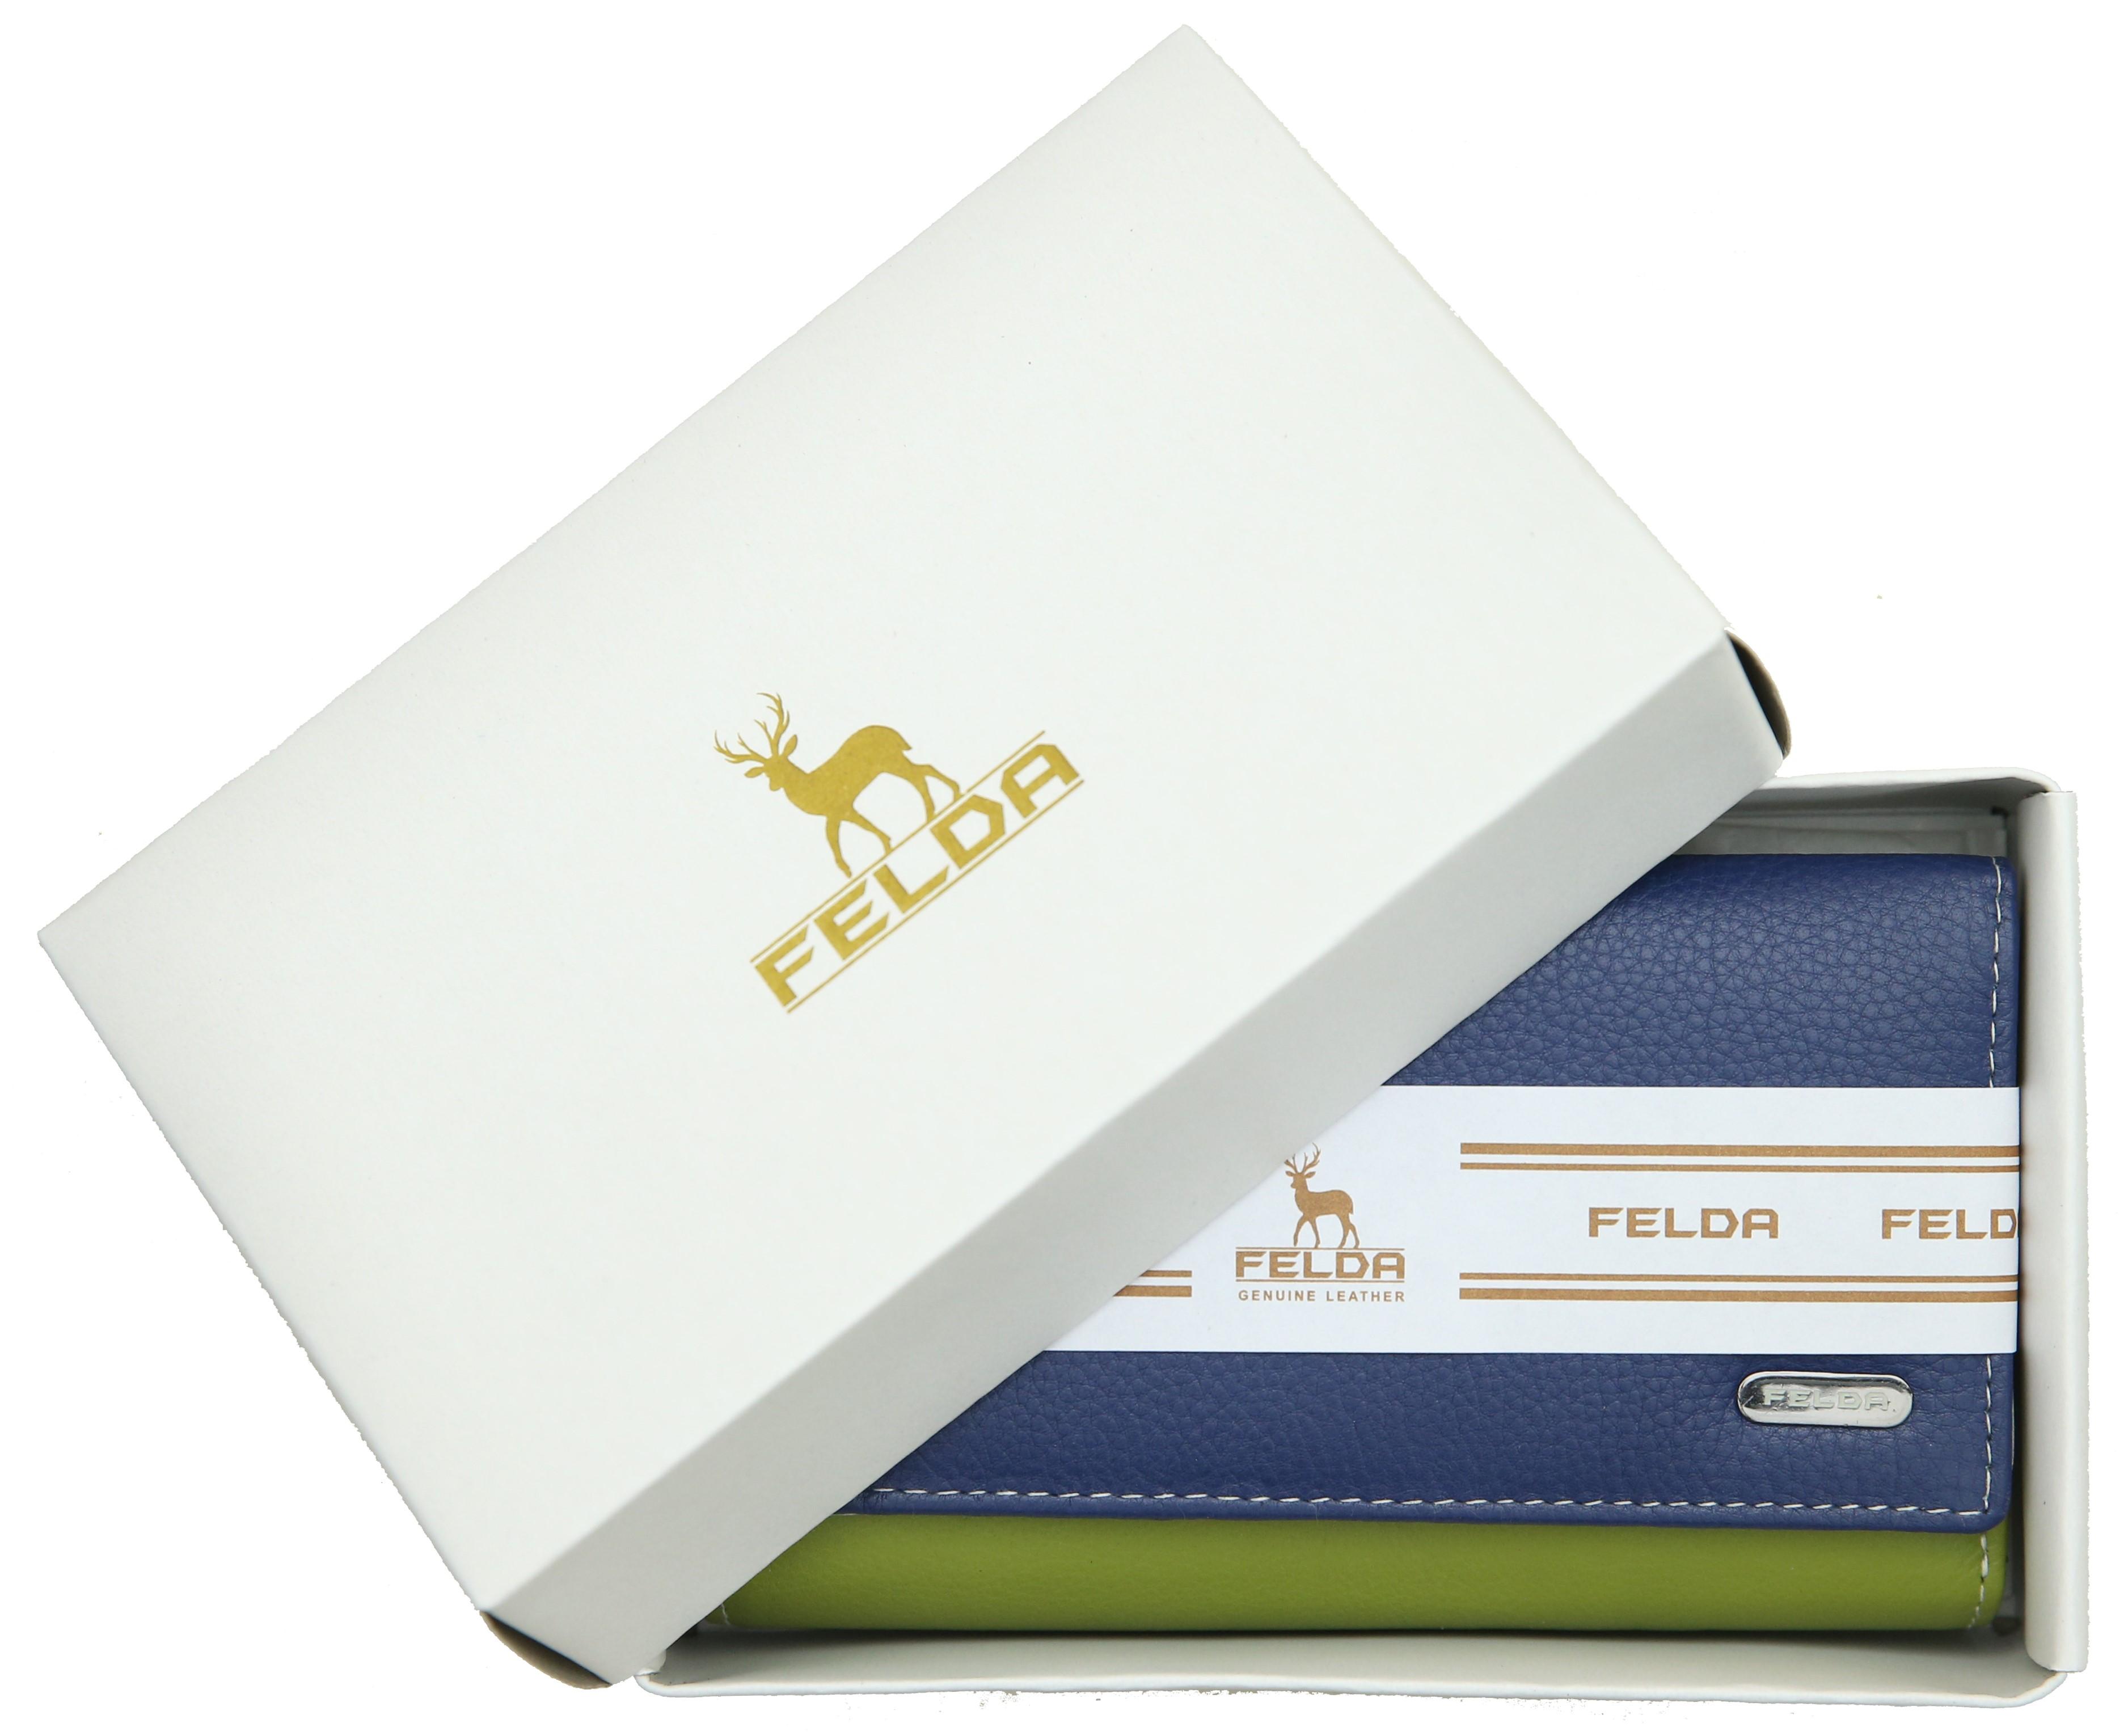 Felda-Portefeuille-pour-cartes-de-credit-cuir-souple-plusieurs-coloris miniature 8